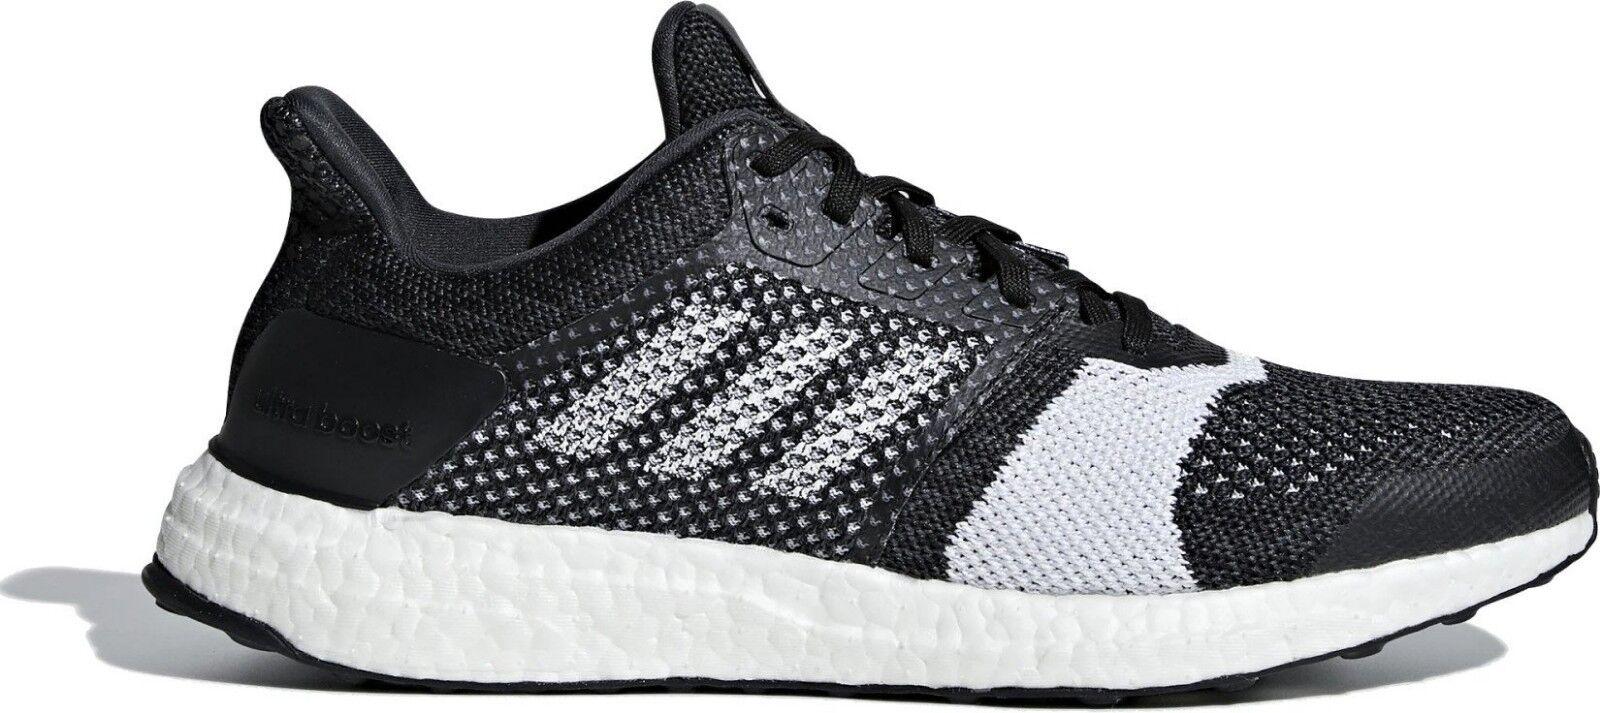 Training Gym Running (B37694) schuhe ST UltraBoost Adidas